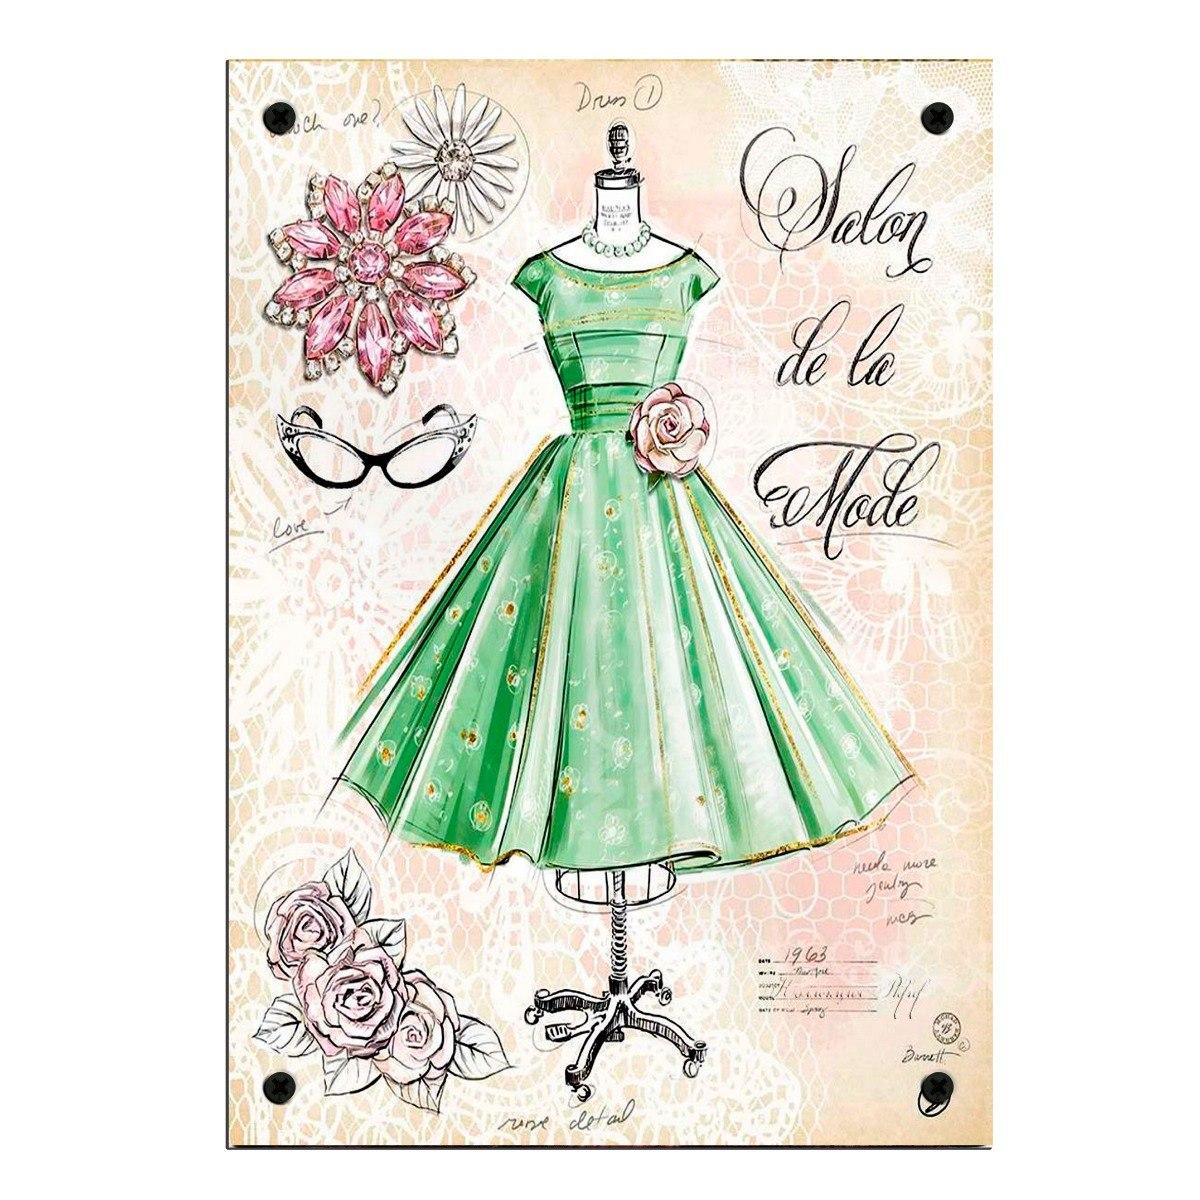 Retro Cartel Decorativa Moda Vestido Vintage Chapa Chic BsQtdrhCxo